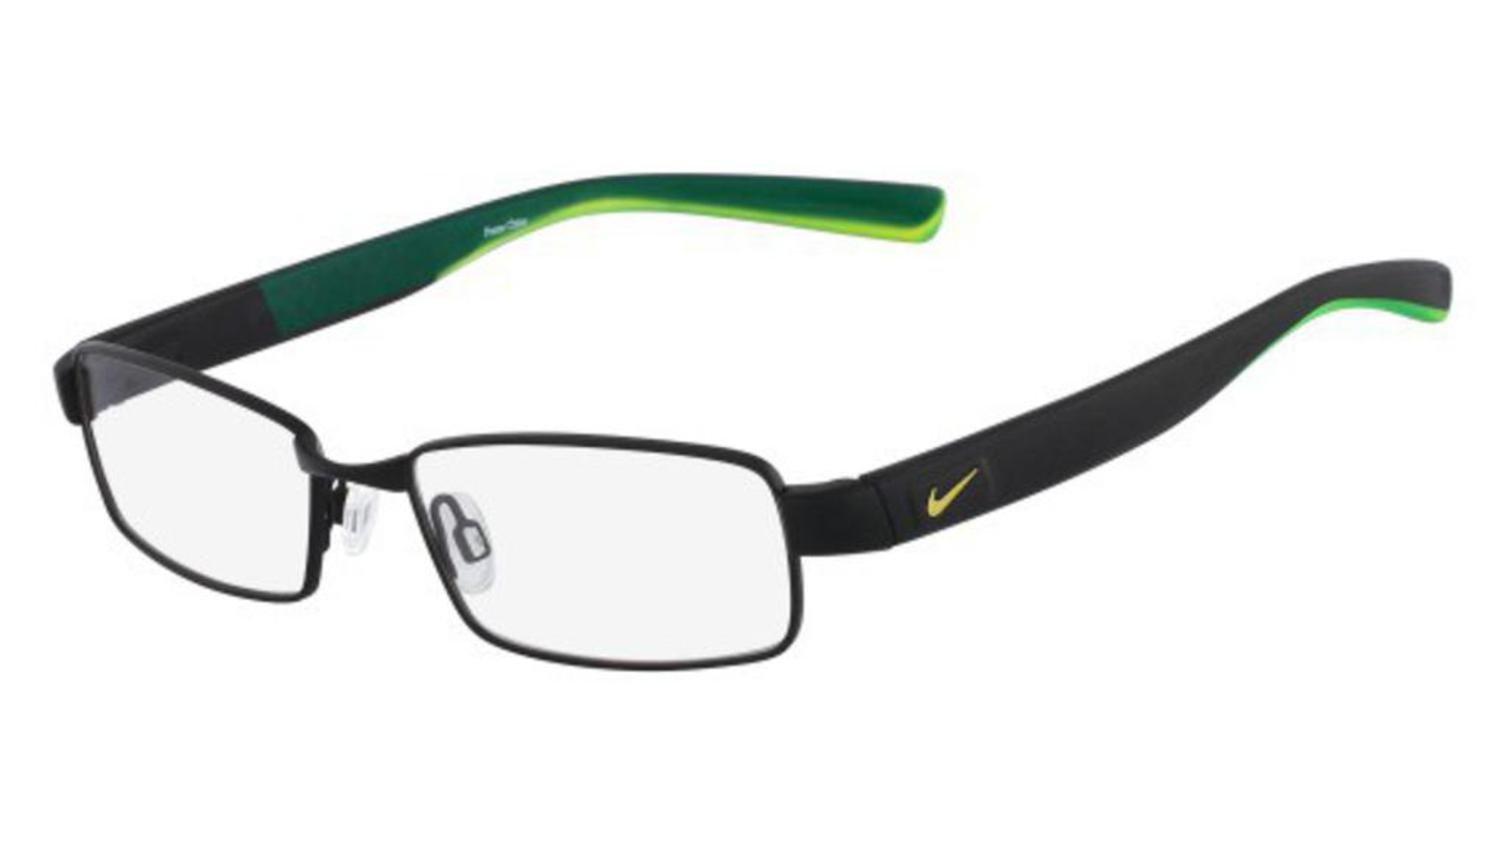 Nike eyeglasses 8167 012 Metal Matt Black - Green